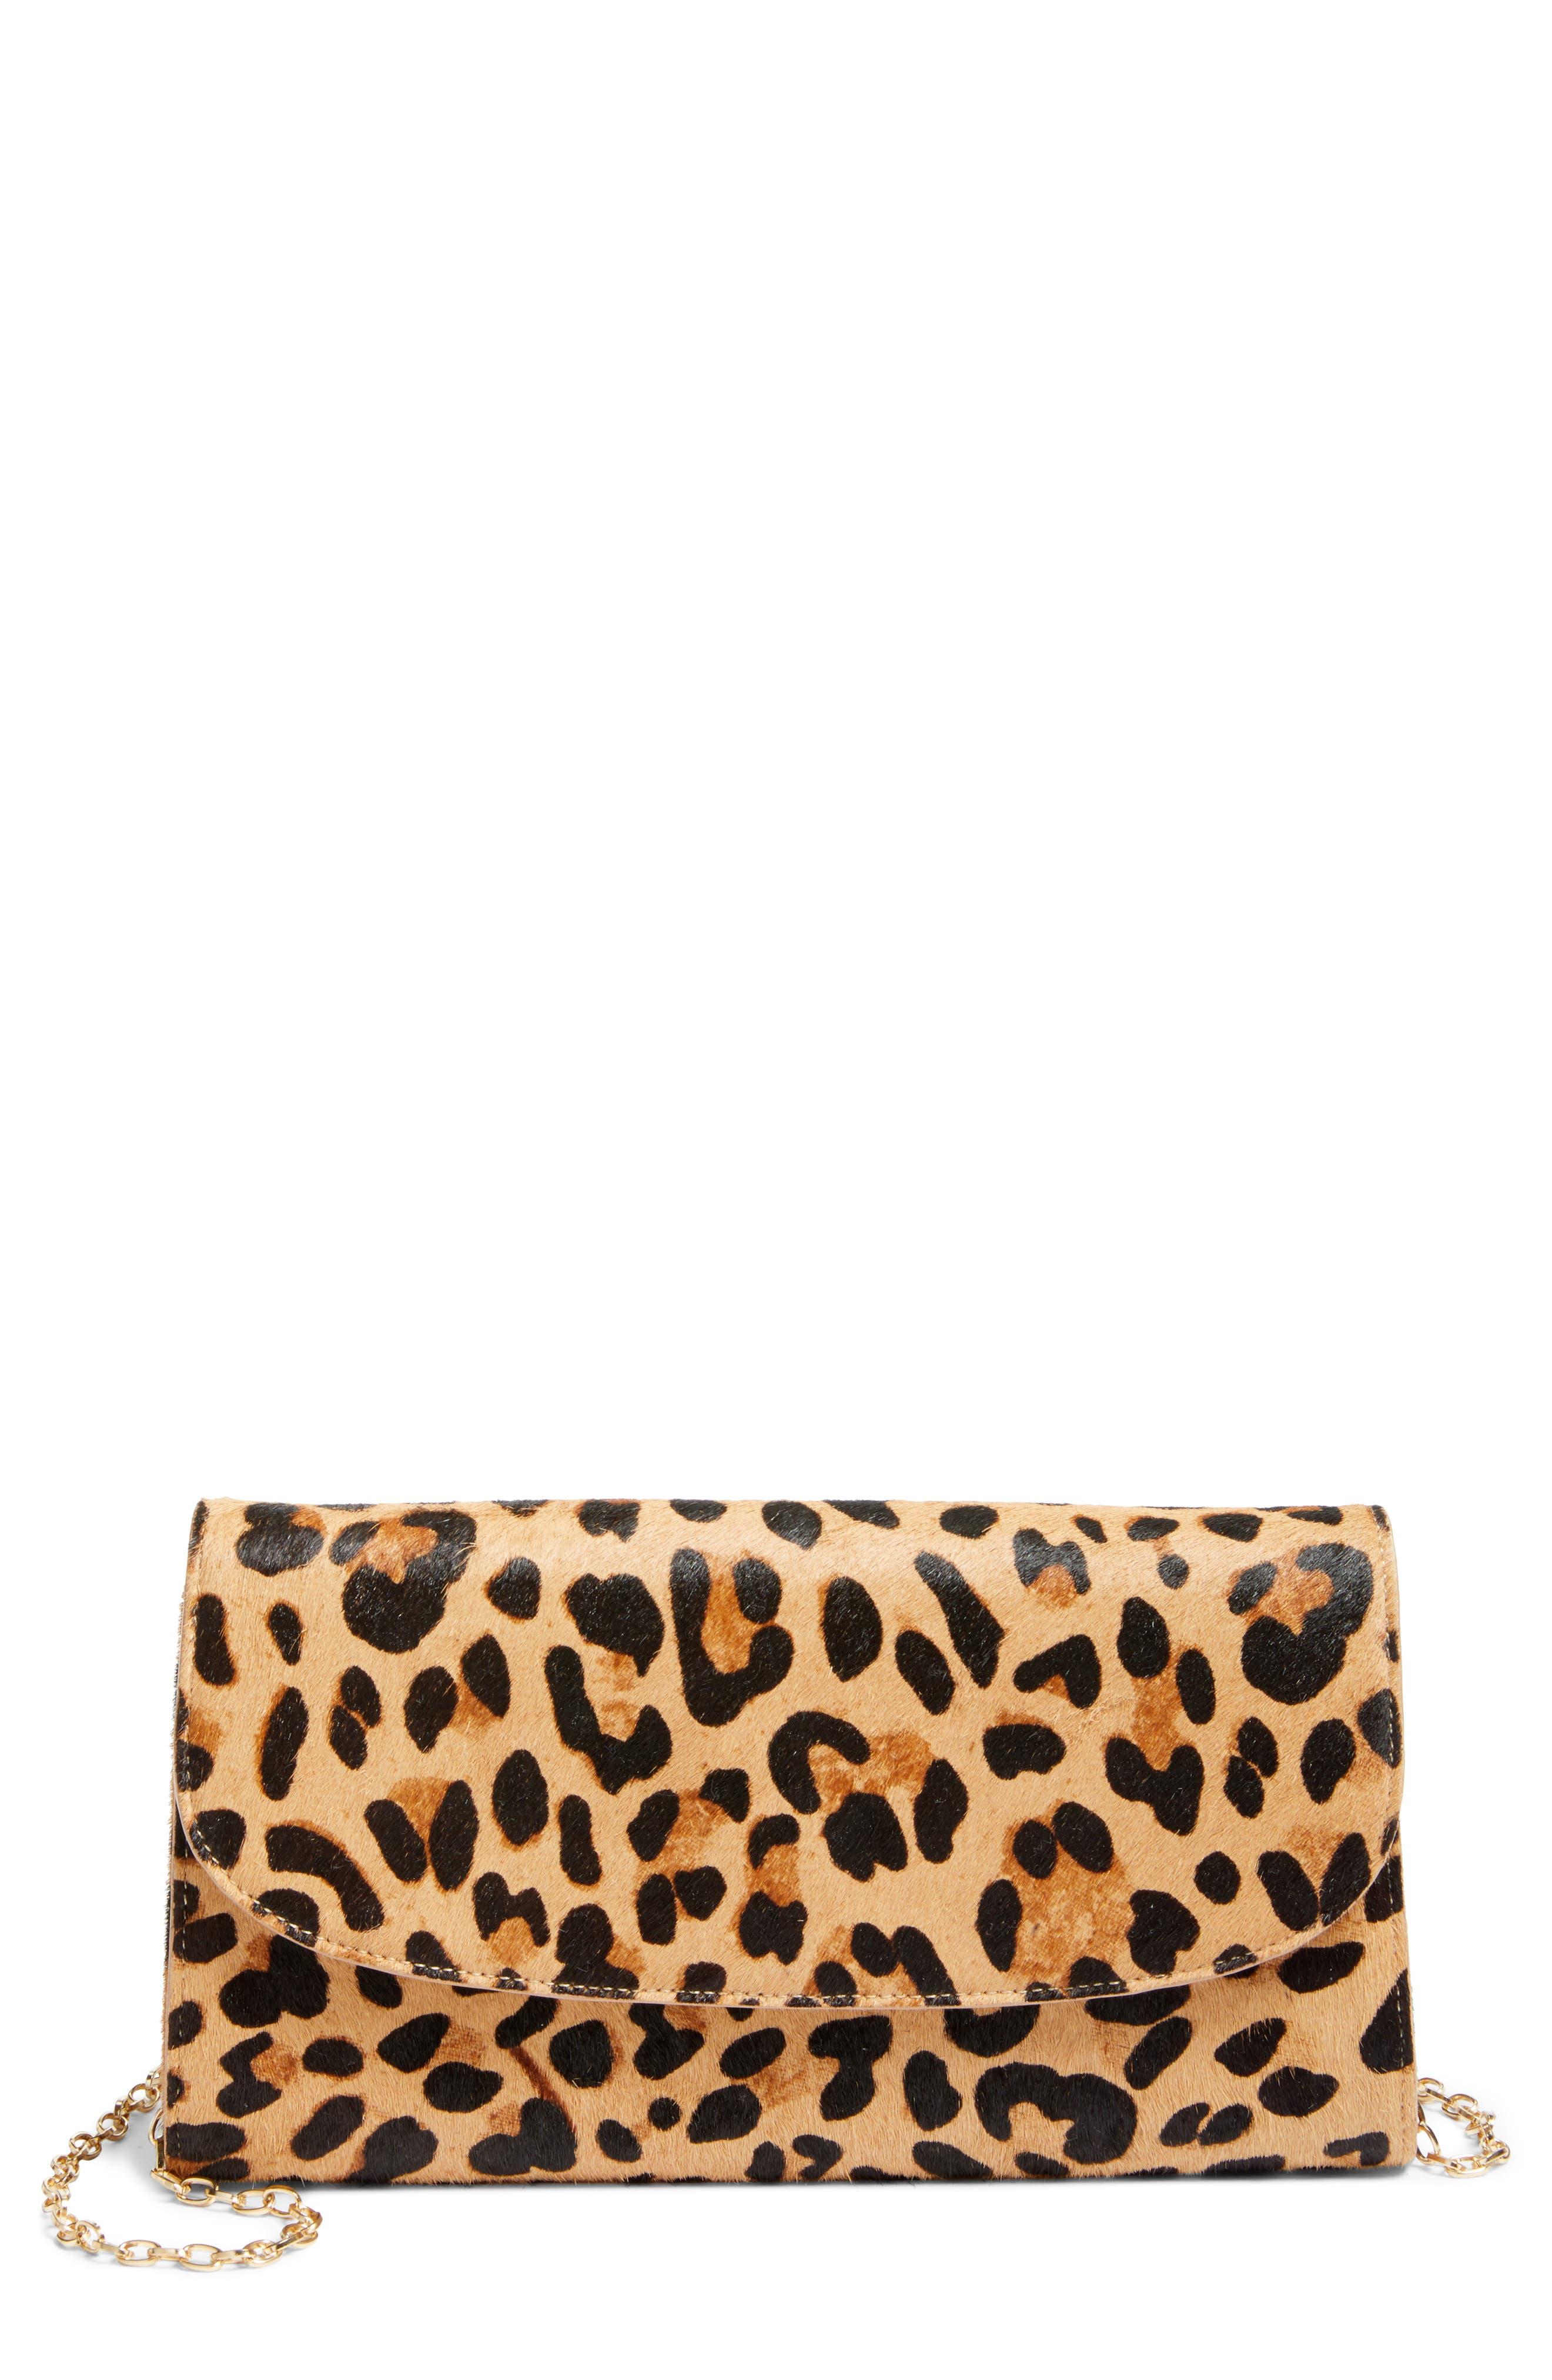 NORDSTROM Genuine Calf Hair Leopard Print Clutch